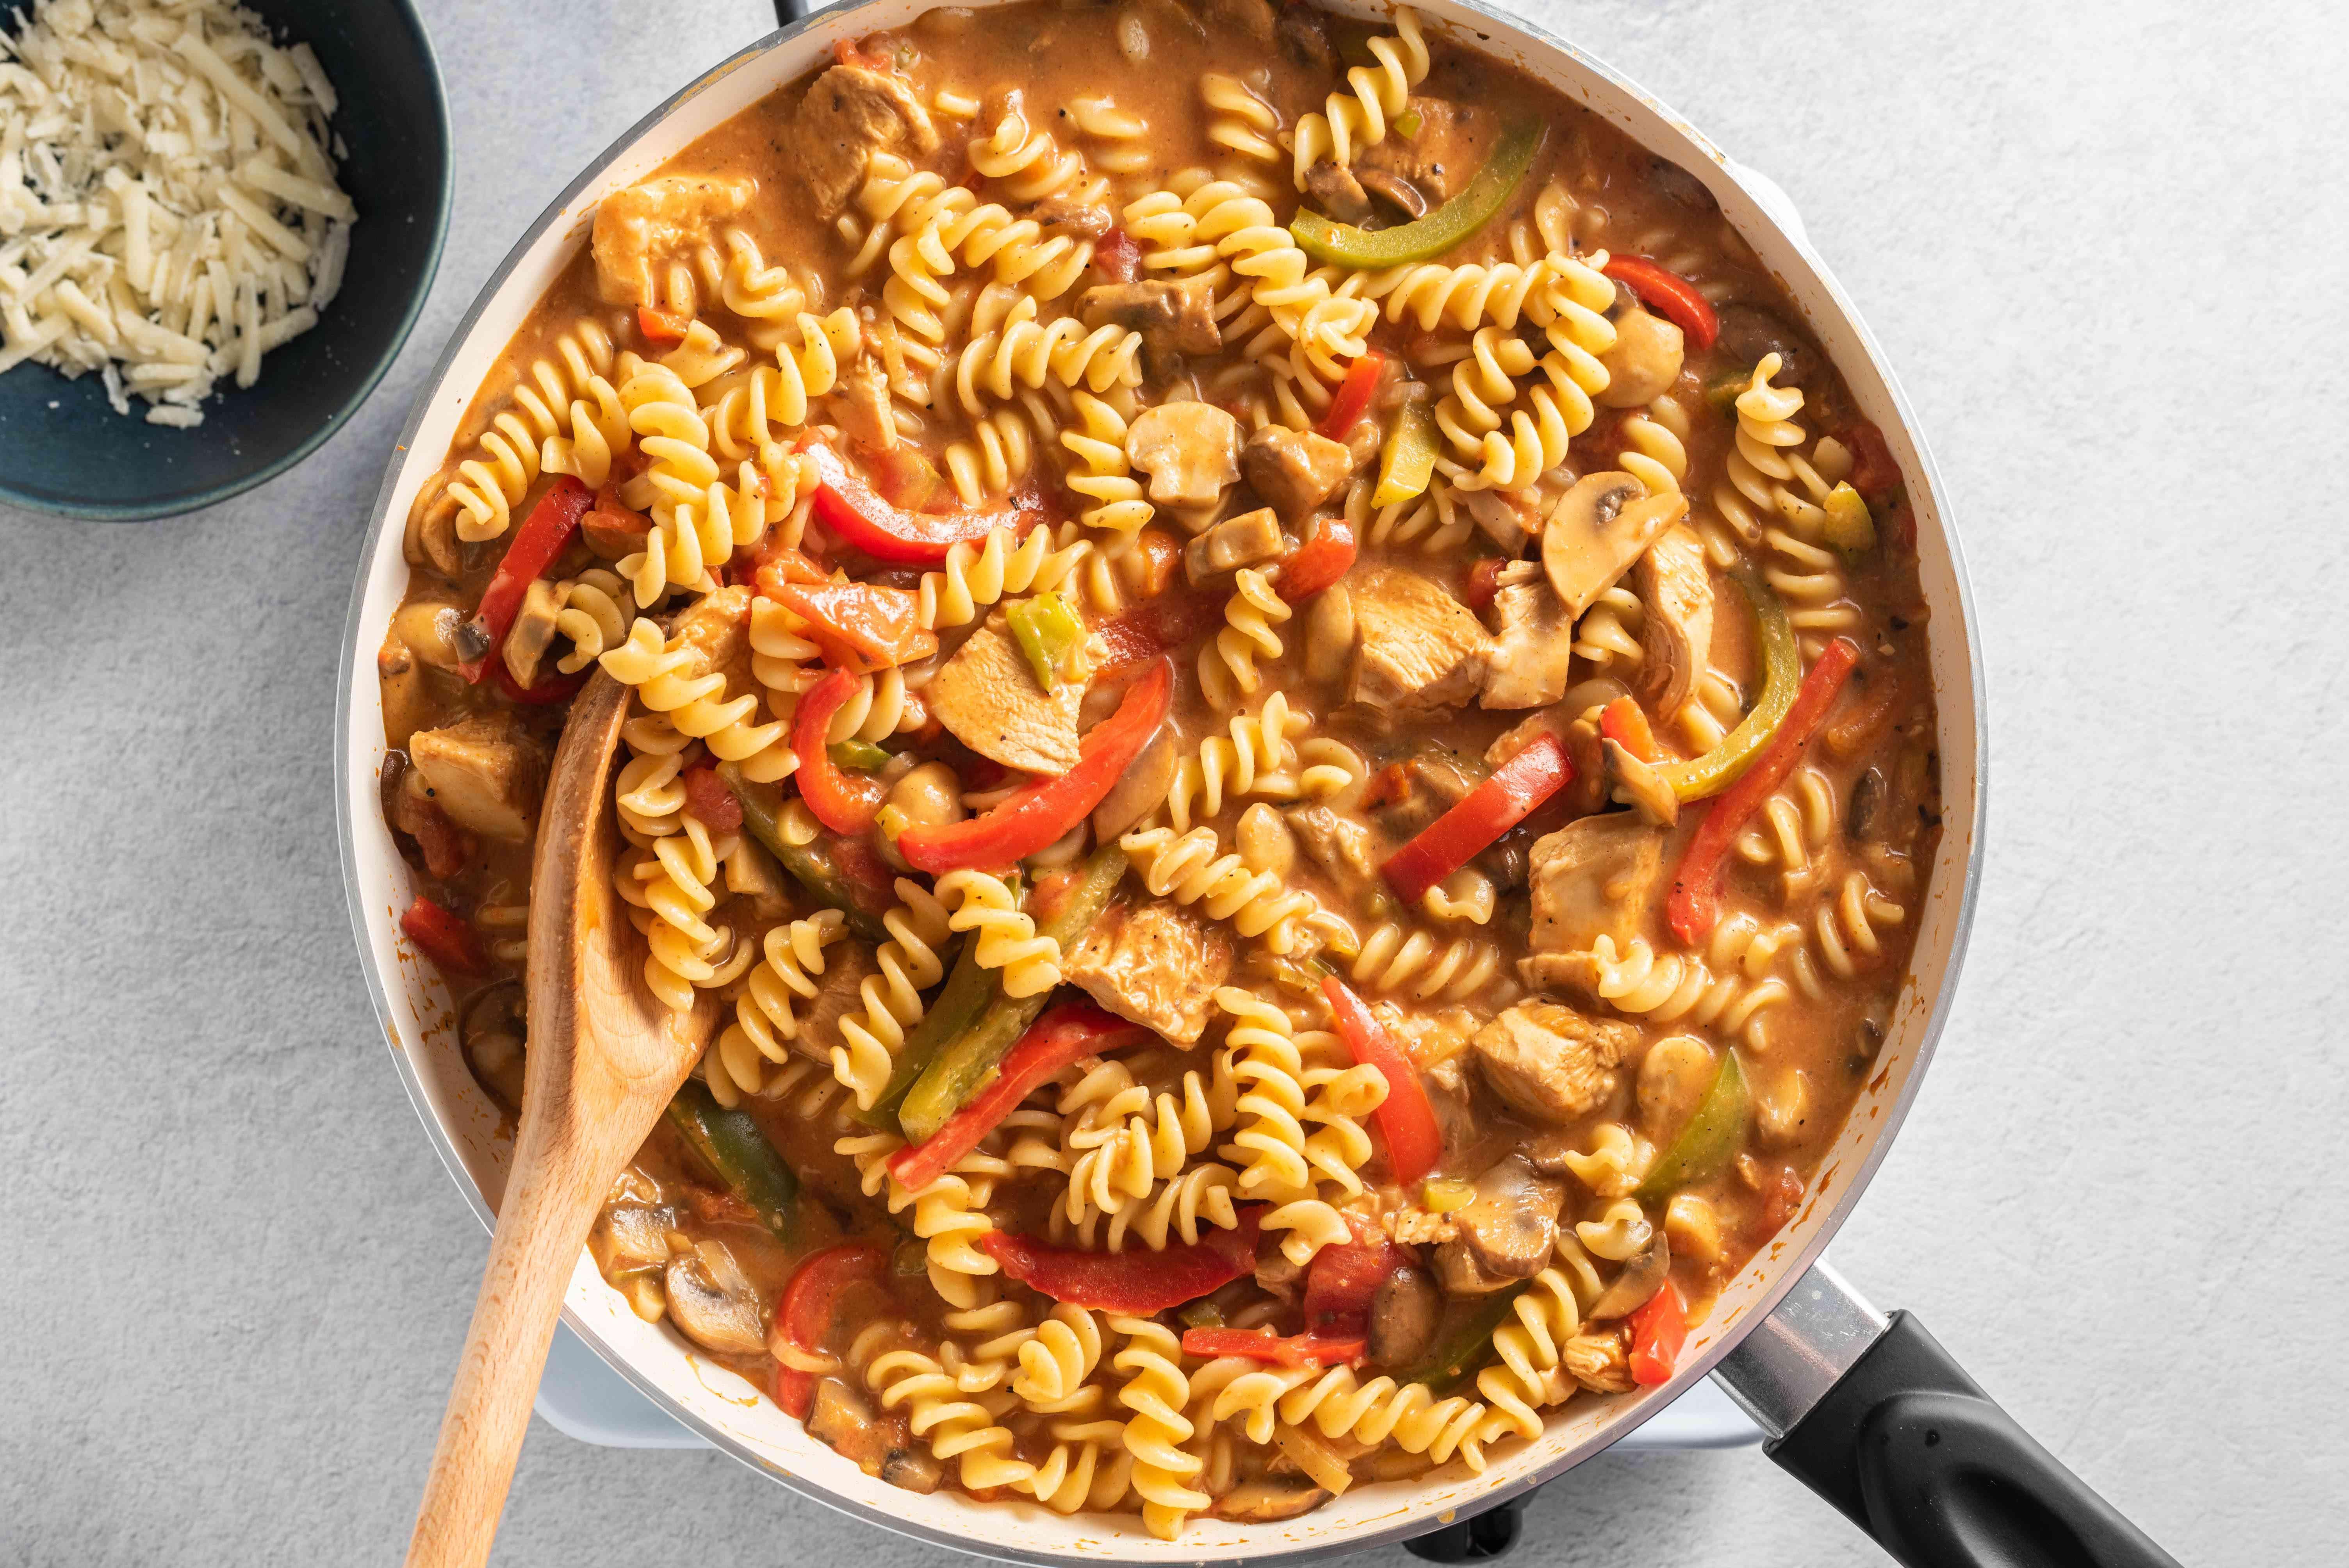 Stir in Parmesan cheese